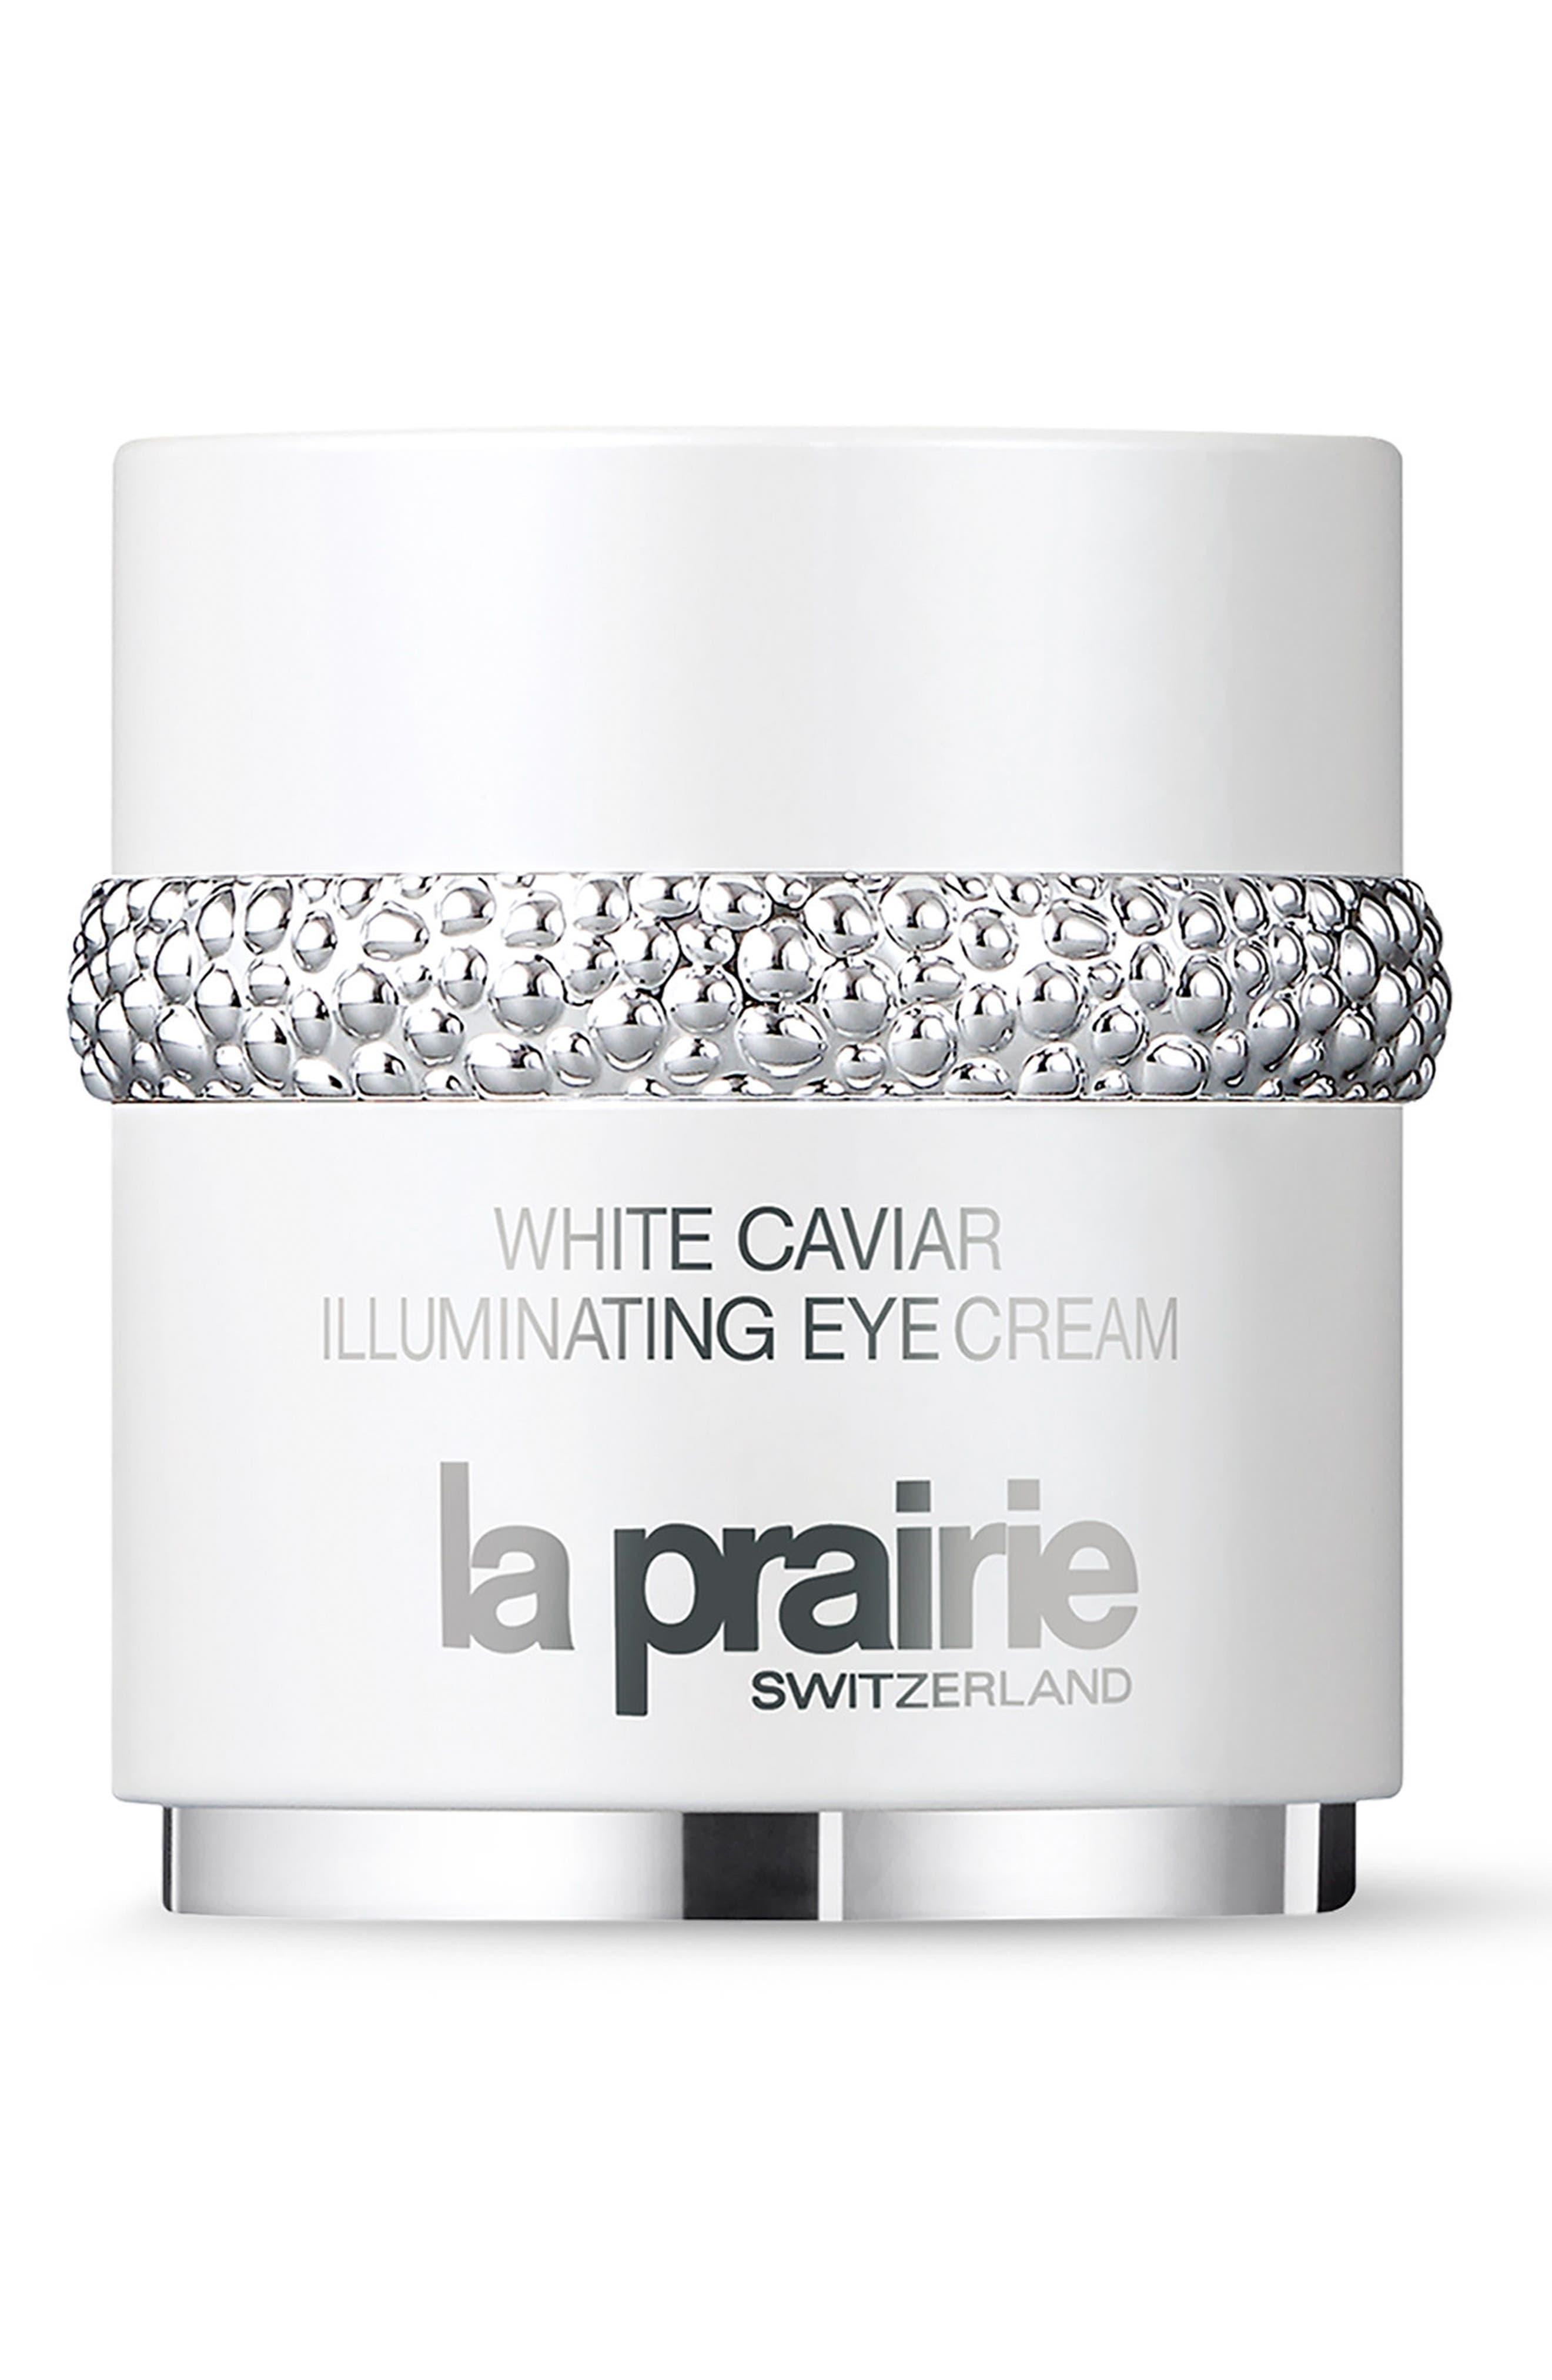 Alternate Image 1 Selected - La Prairie 'White Caviar' Illuminating Eye Cream